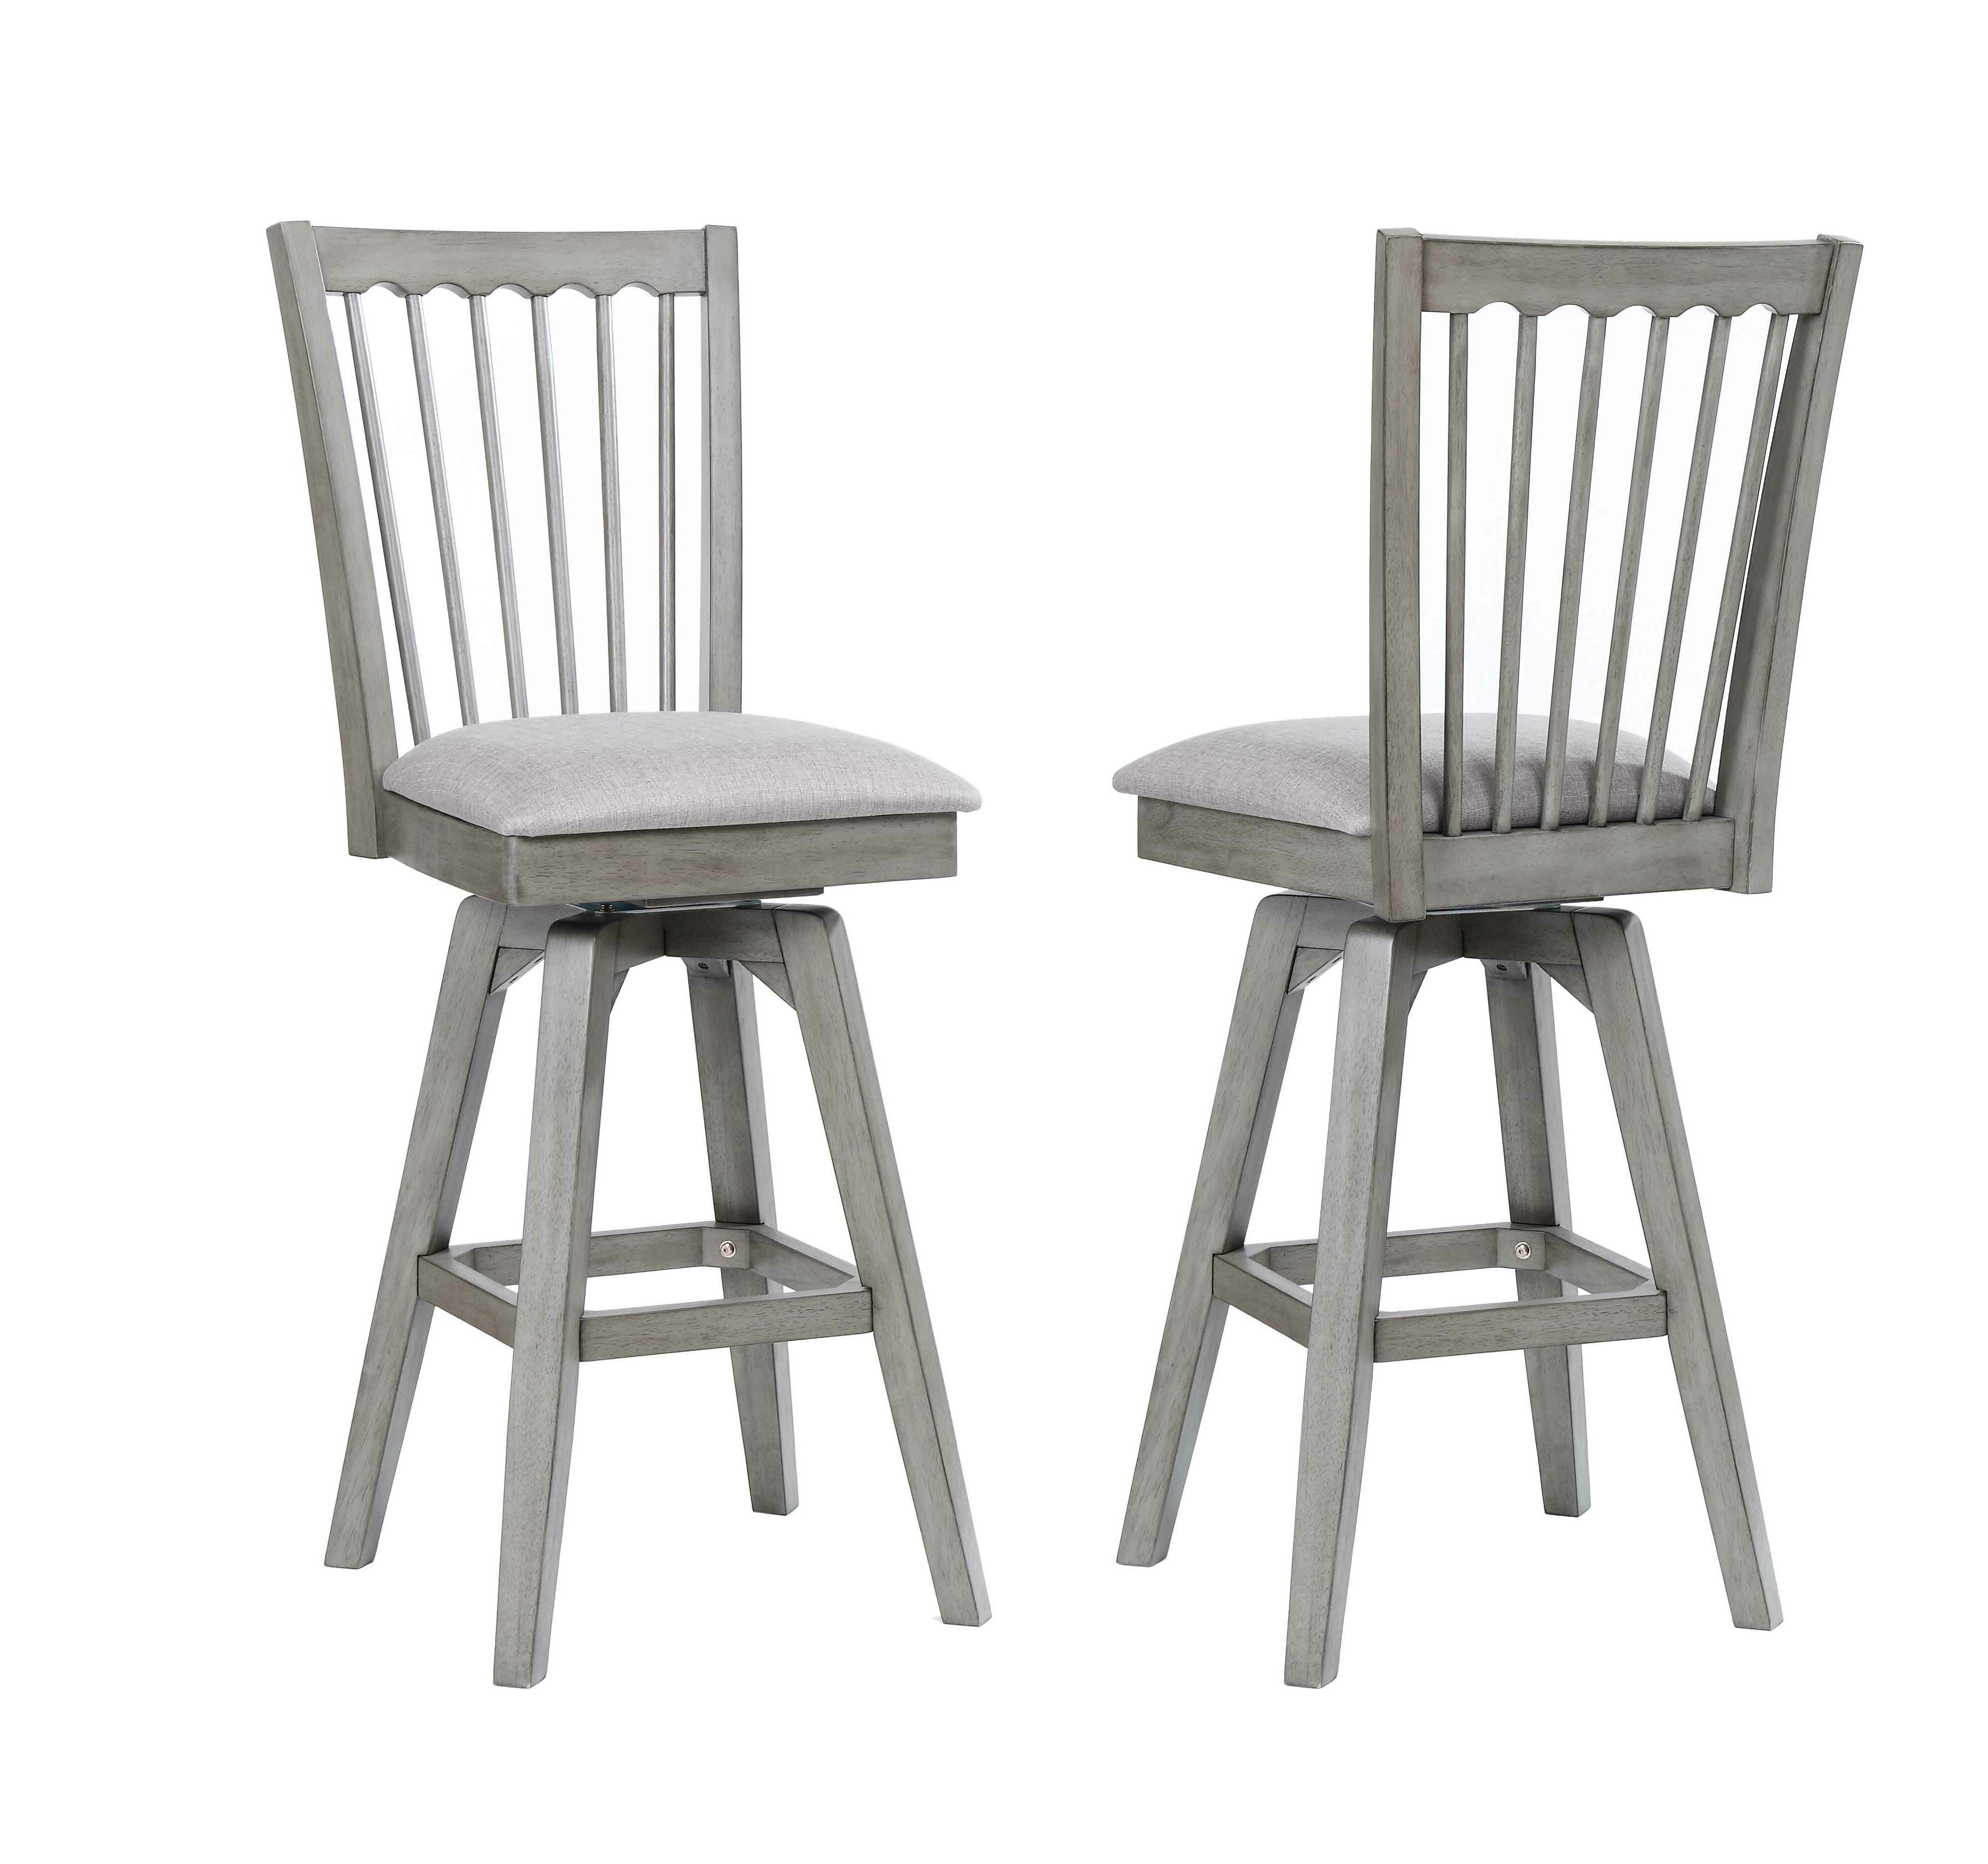 Amazing Vergara Spindle Back 28 Swivel Bar Stool Evergreenethics Interior Chair Design Evergreenethicsorg